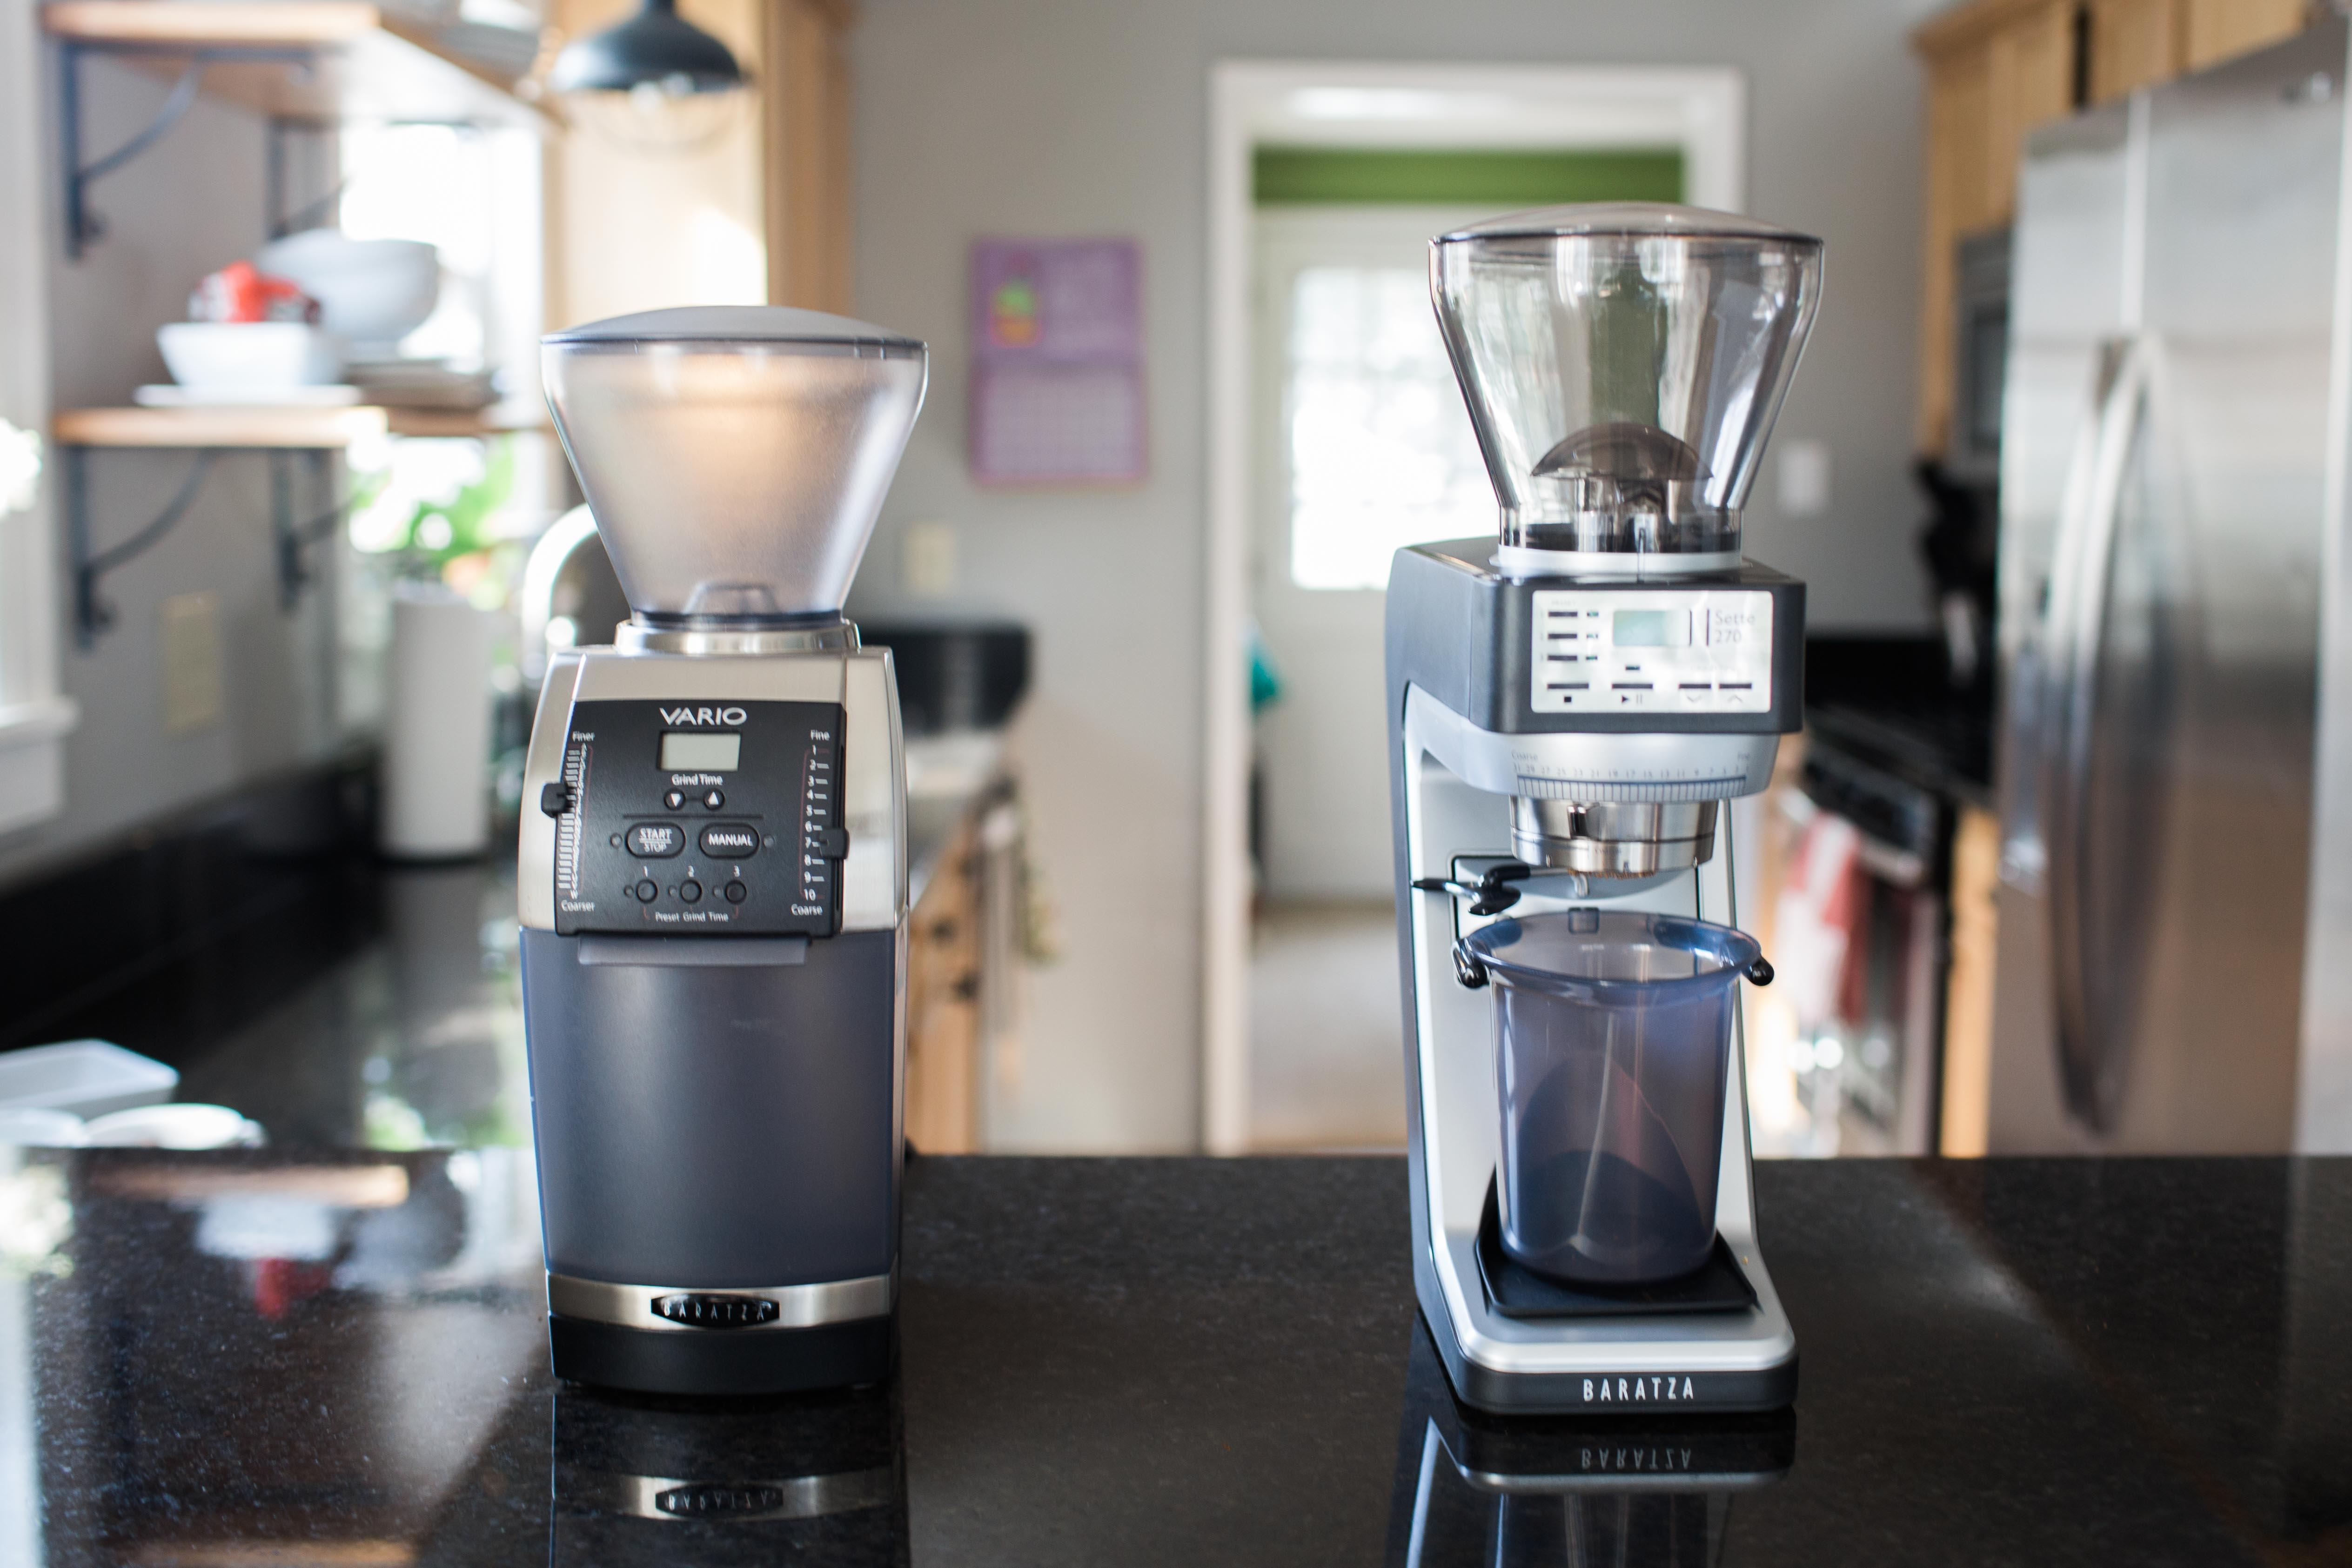 Baratza espresso grinders